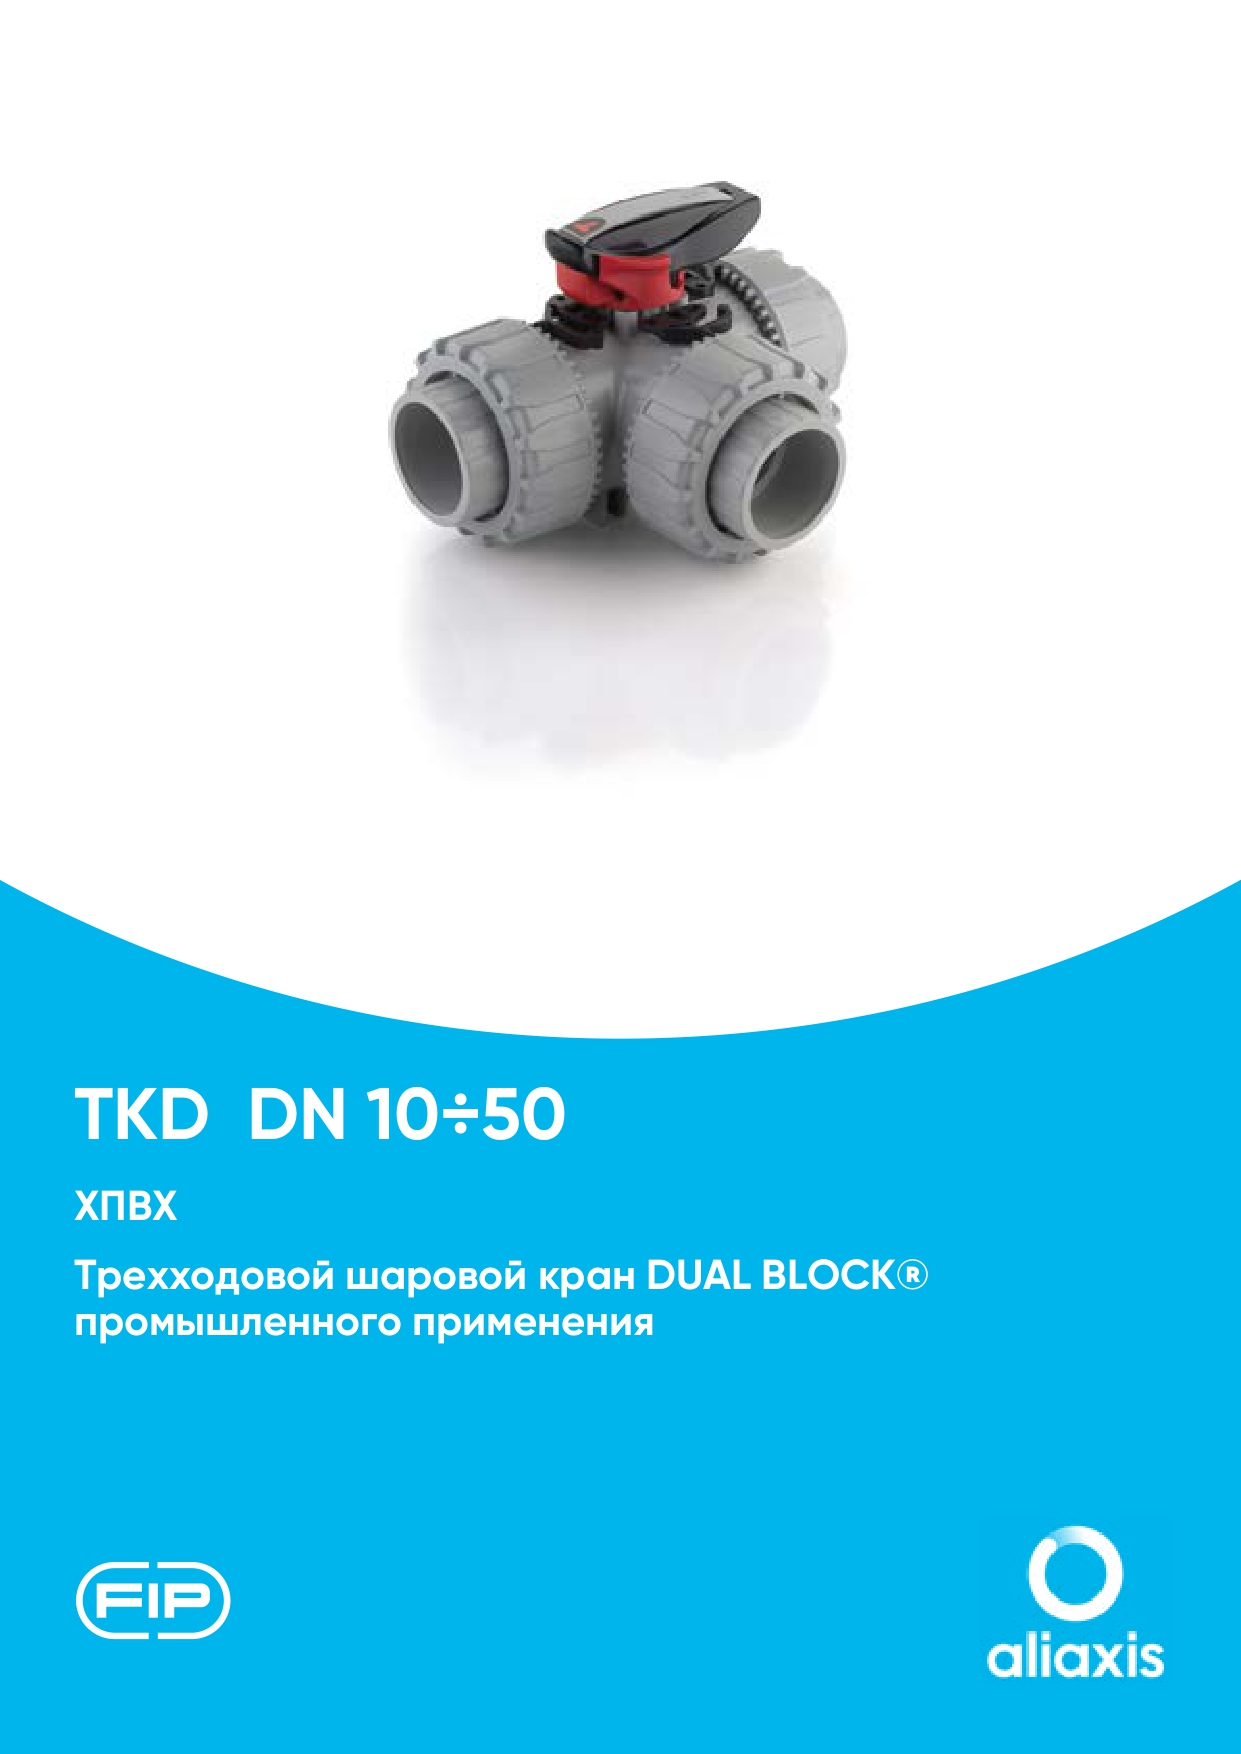 Трехходовые шаровые краны TKD DN15-50 из ХПВХ